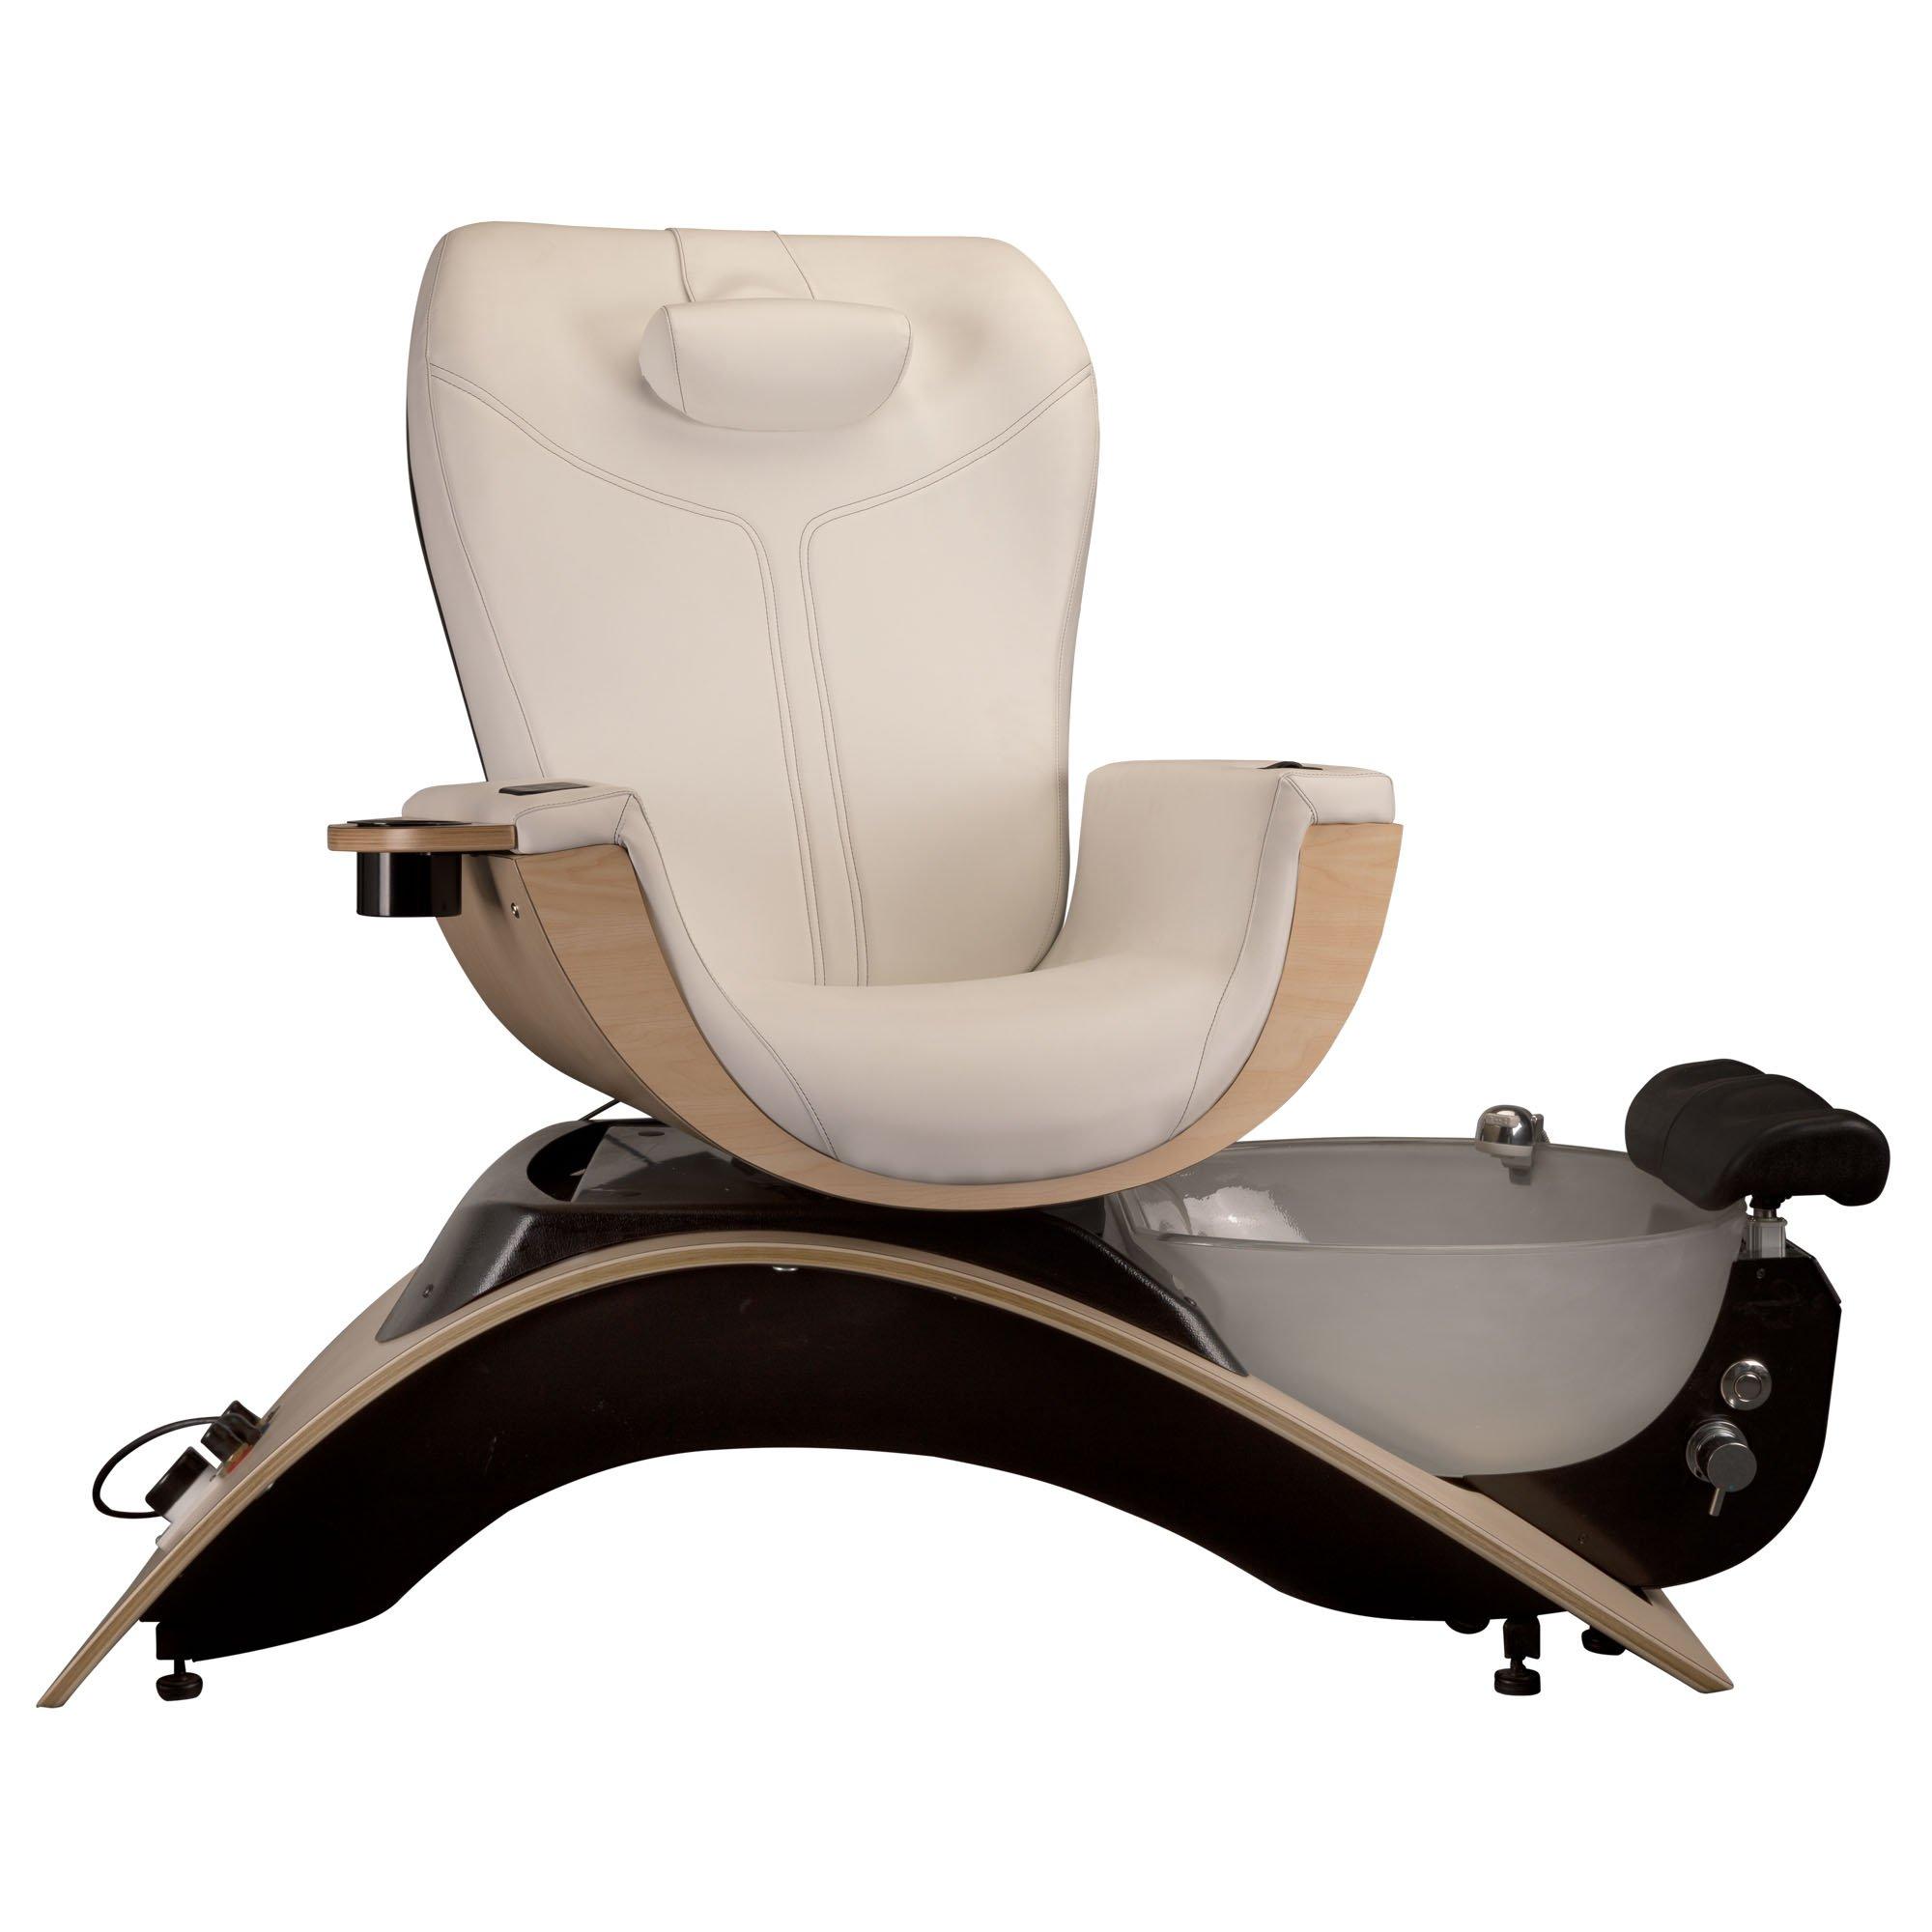 Opus_One_-_Swivel_Chair_1024x1024@2x